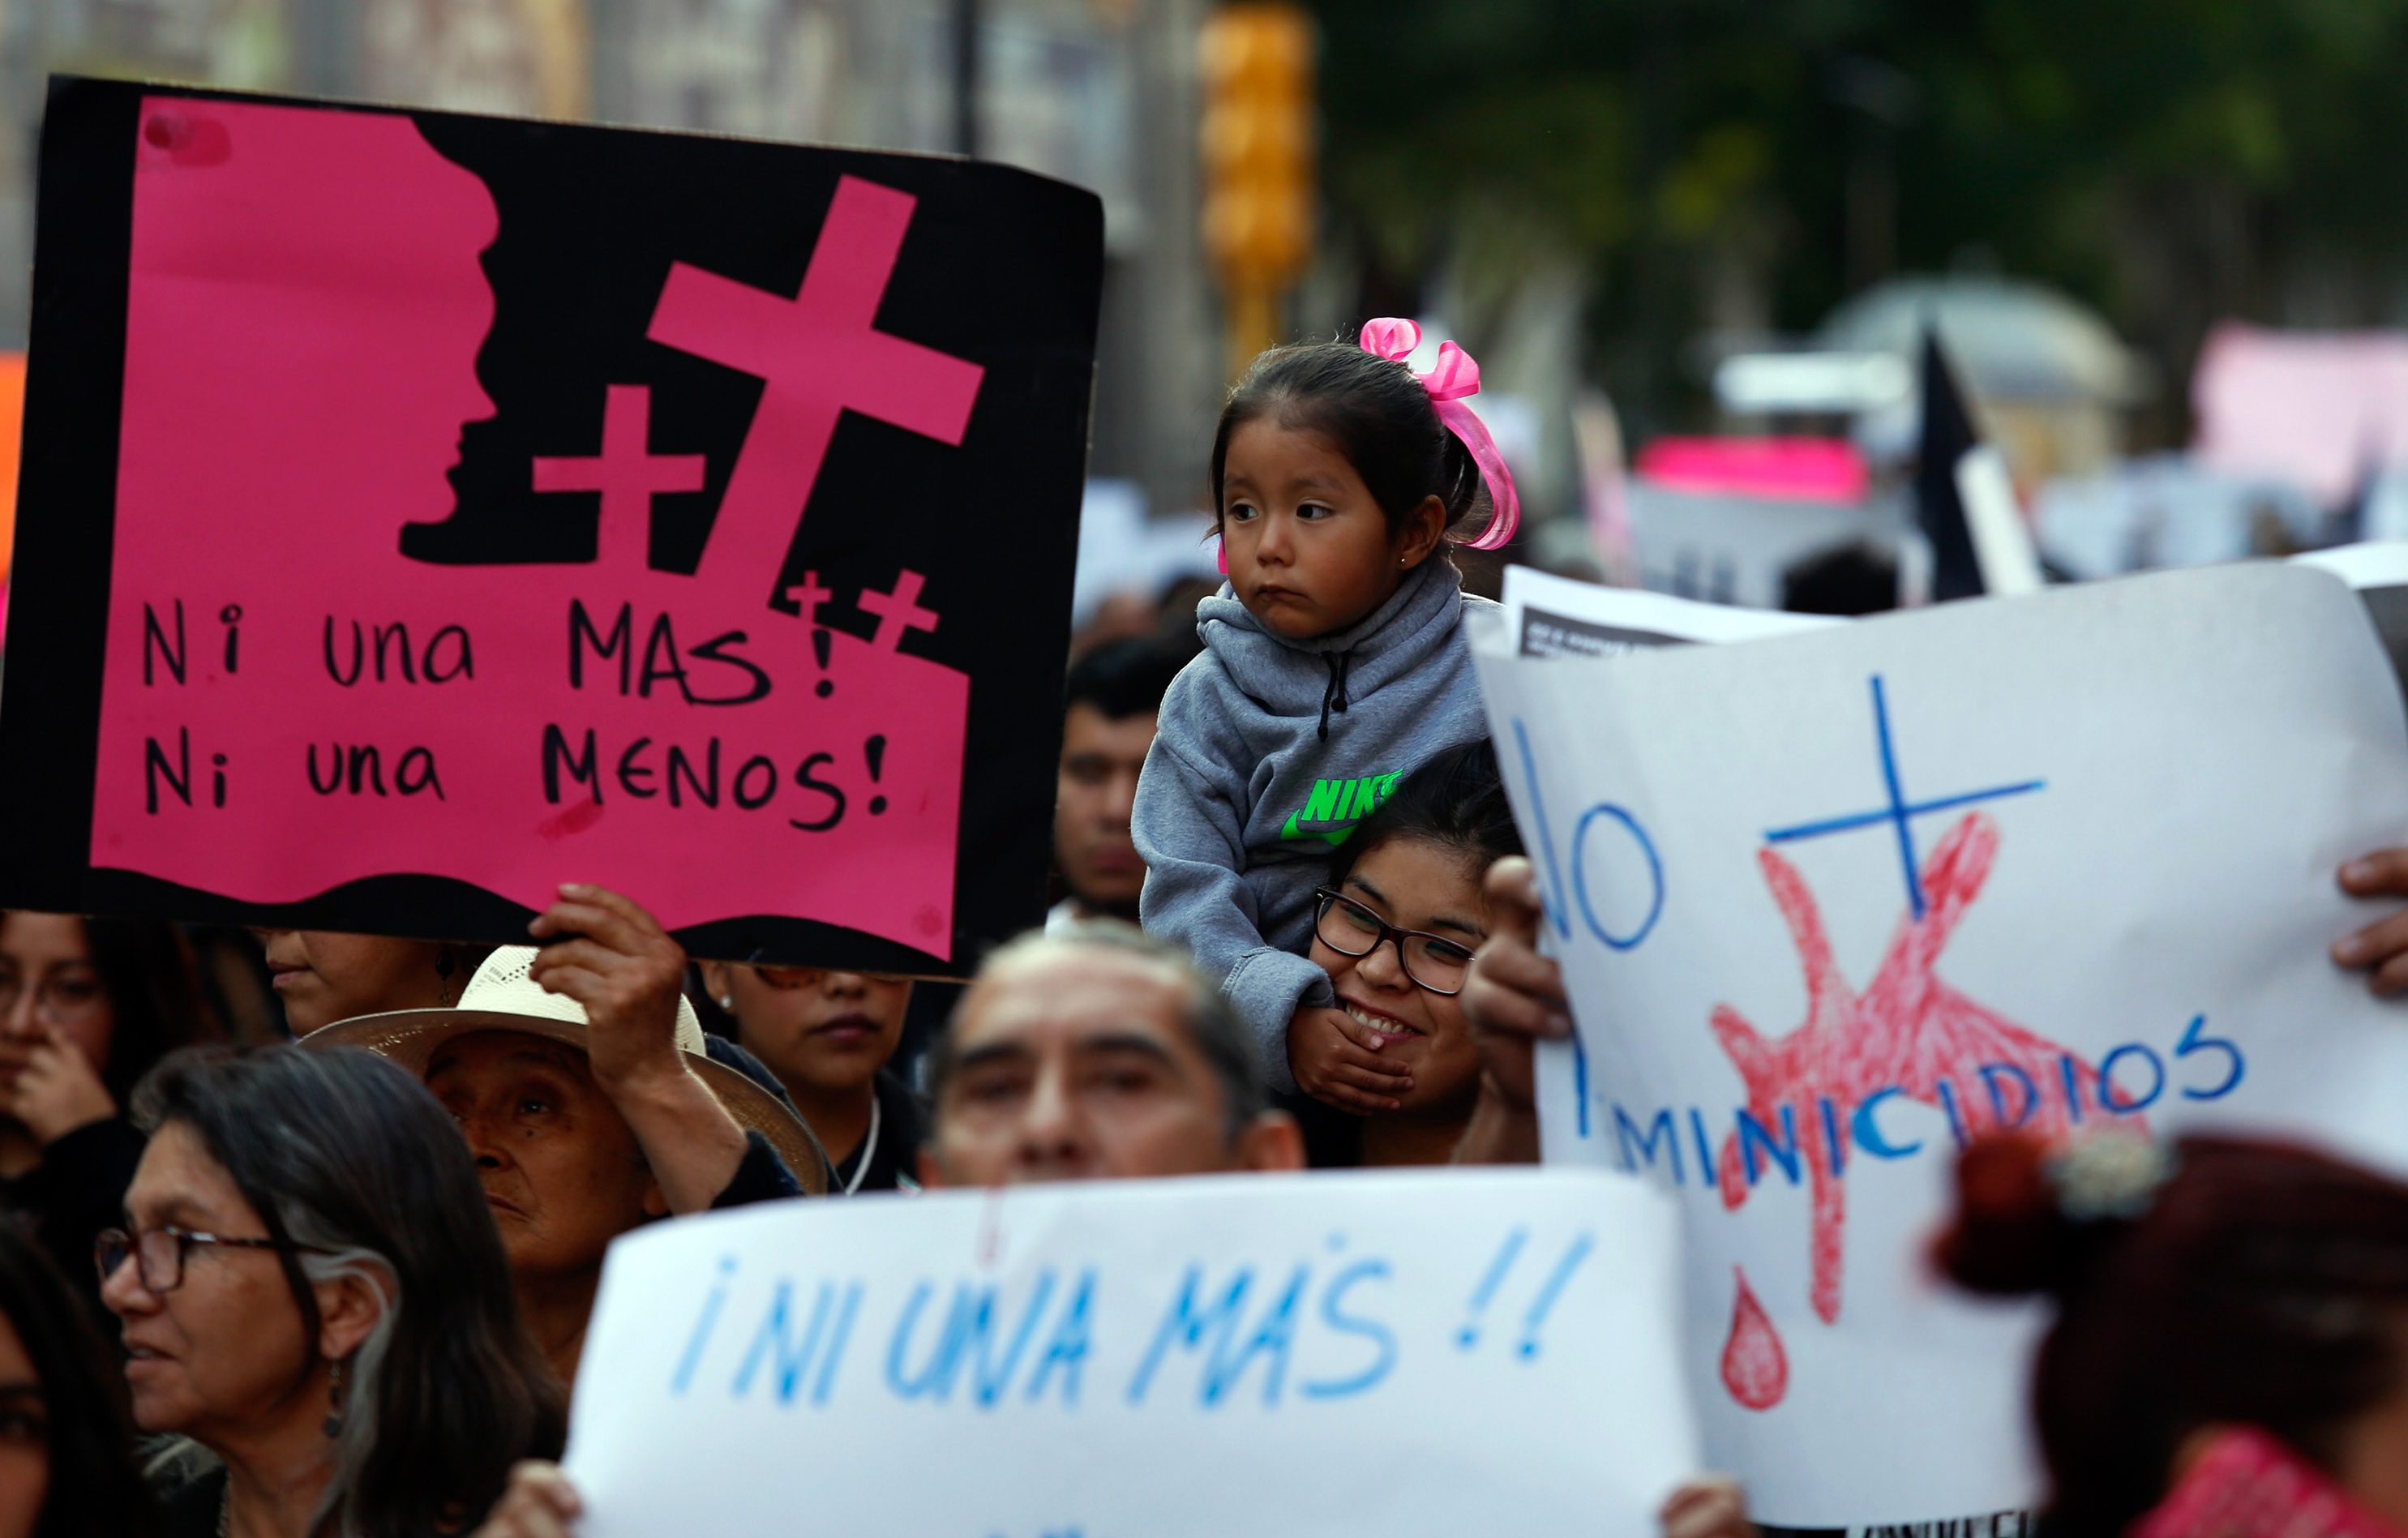 La CNDH se suma a la iniciativa #MxEnAlertaDeGénero